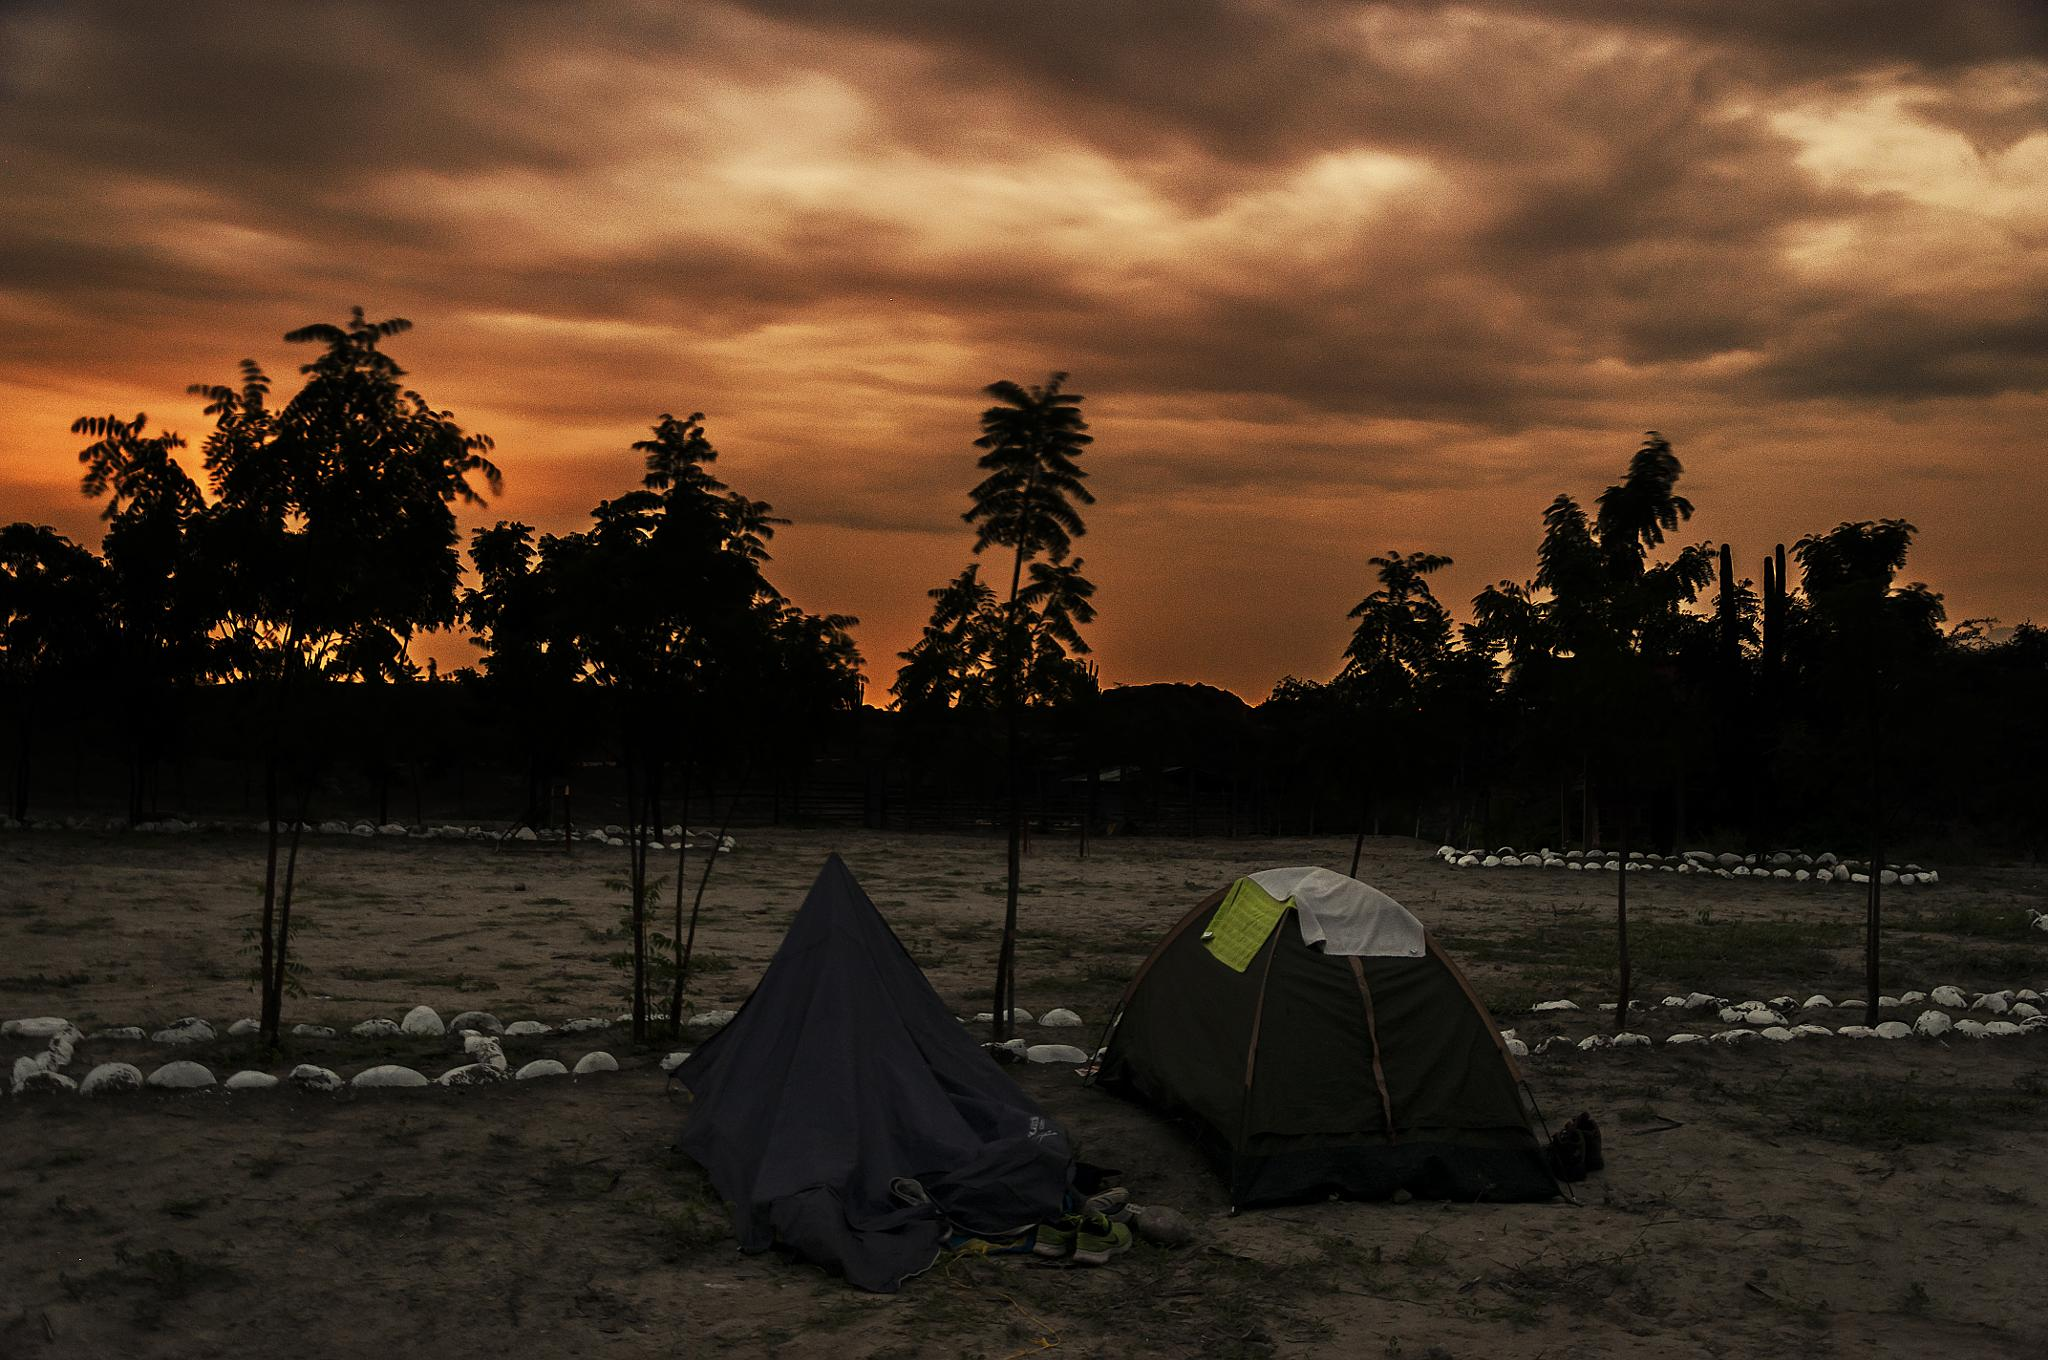 Camping under the Tatacoa´s  desert sky  by Andres Grajales